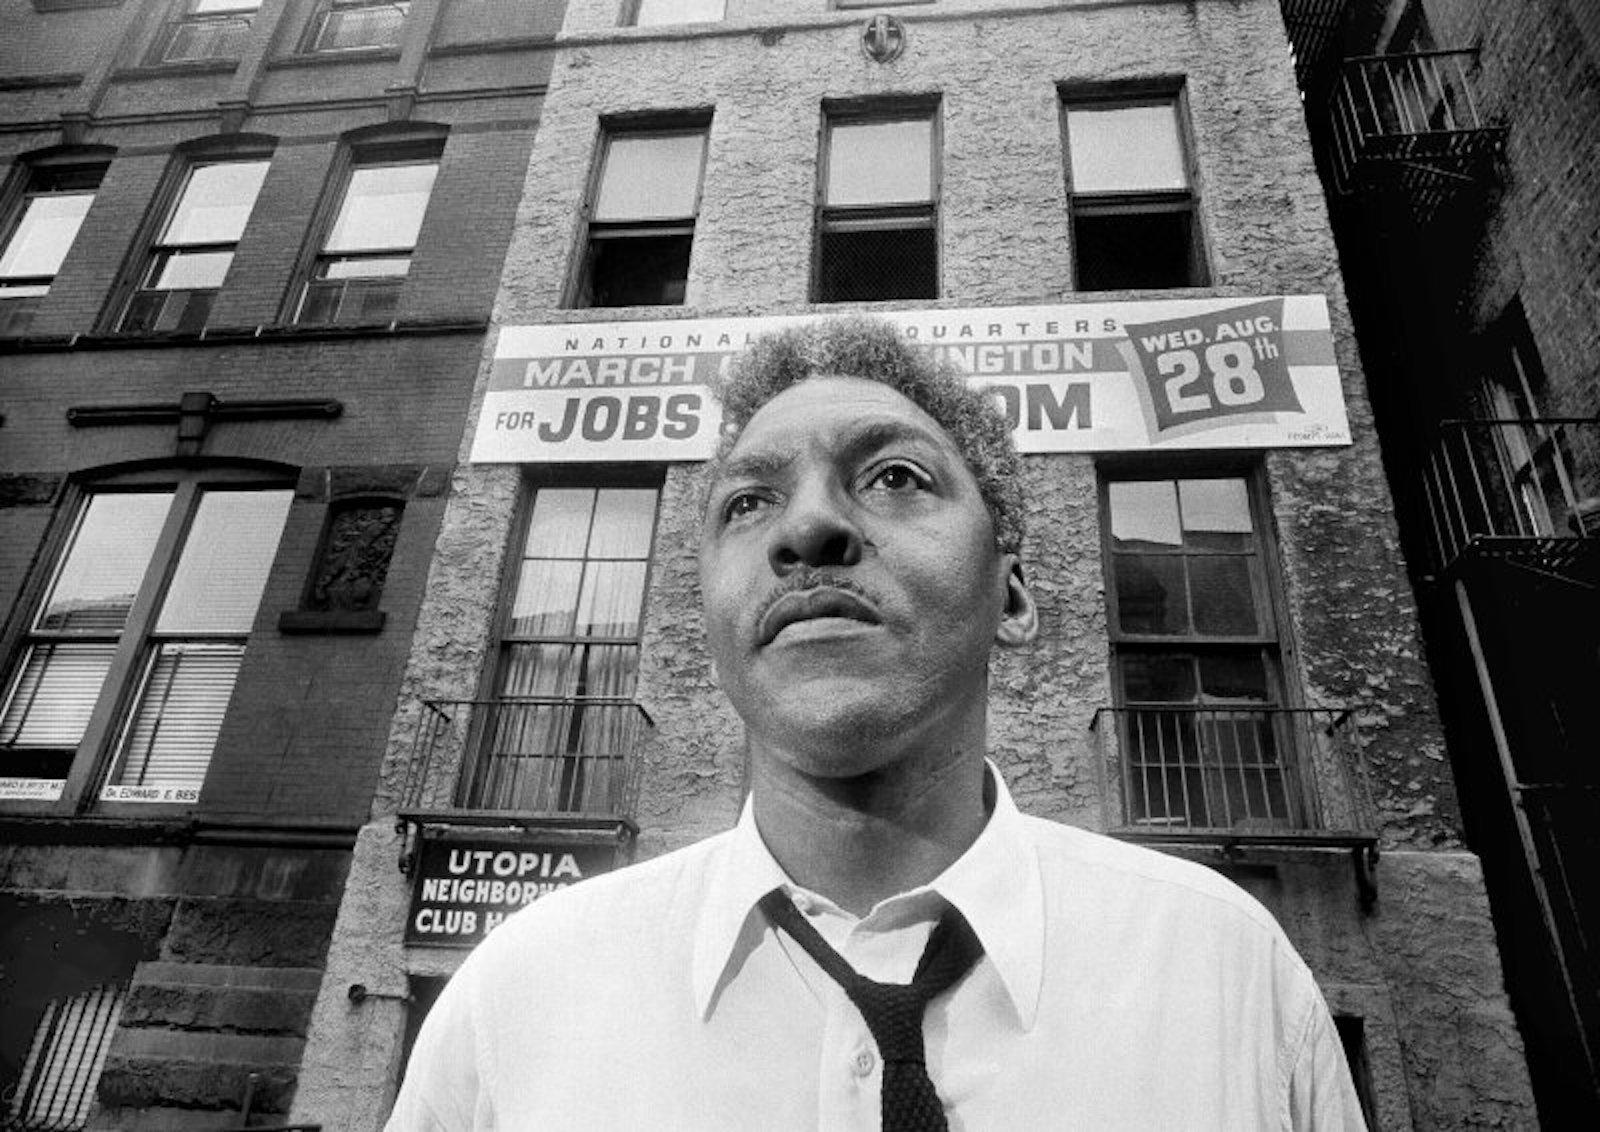 Bayard Rustin, African American History, Black History, LGBTQ, LGBTQ Rights, Civil Rights, KOLUMN Magazine, KOLUMN, KINDR'D Magazine, KINDR'D, Willoughby Avenue, Wriit,